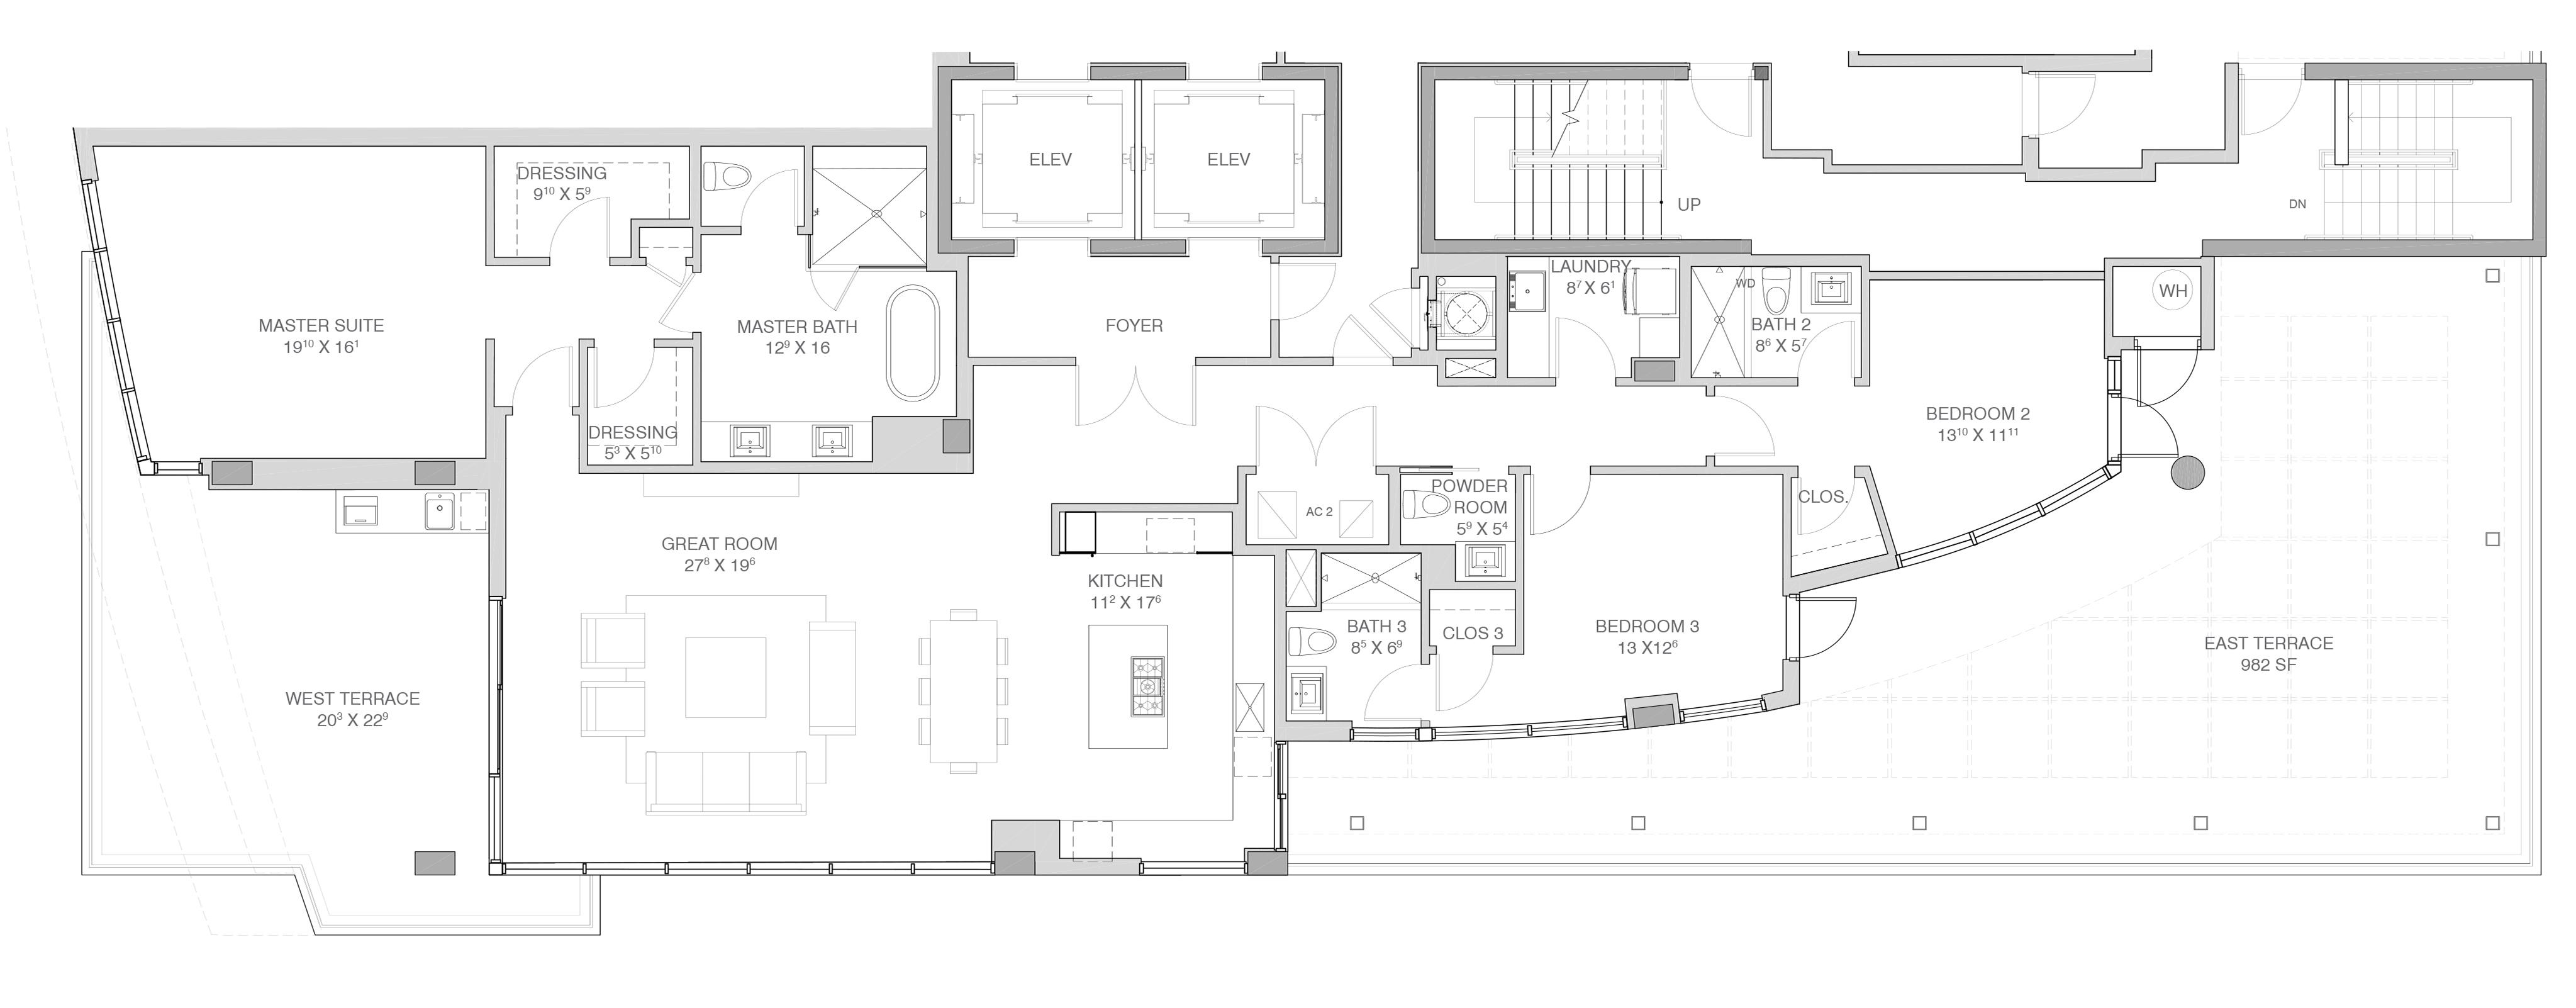 Adagio Fort Lauderdale Beach - Floorplan 5